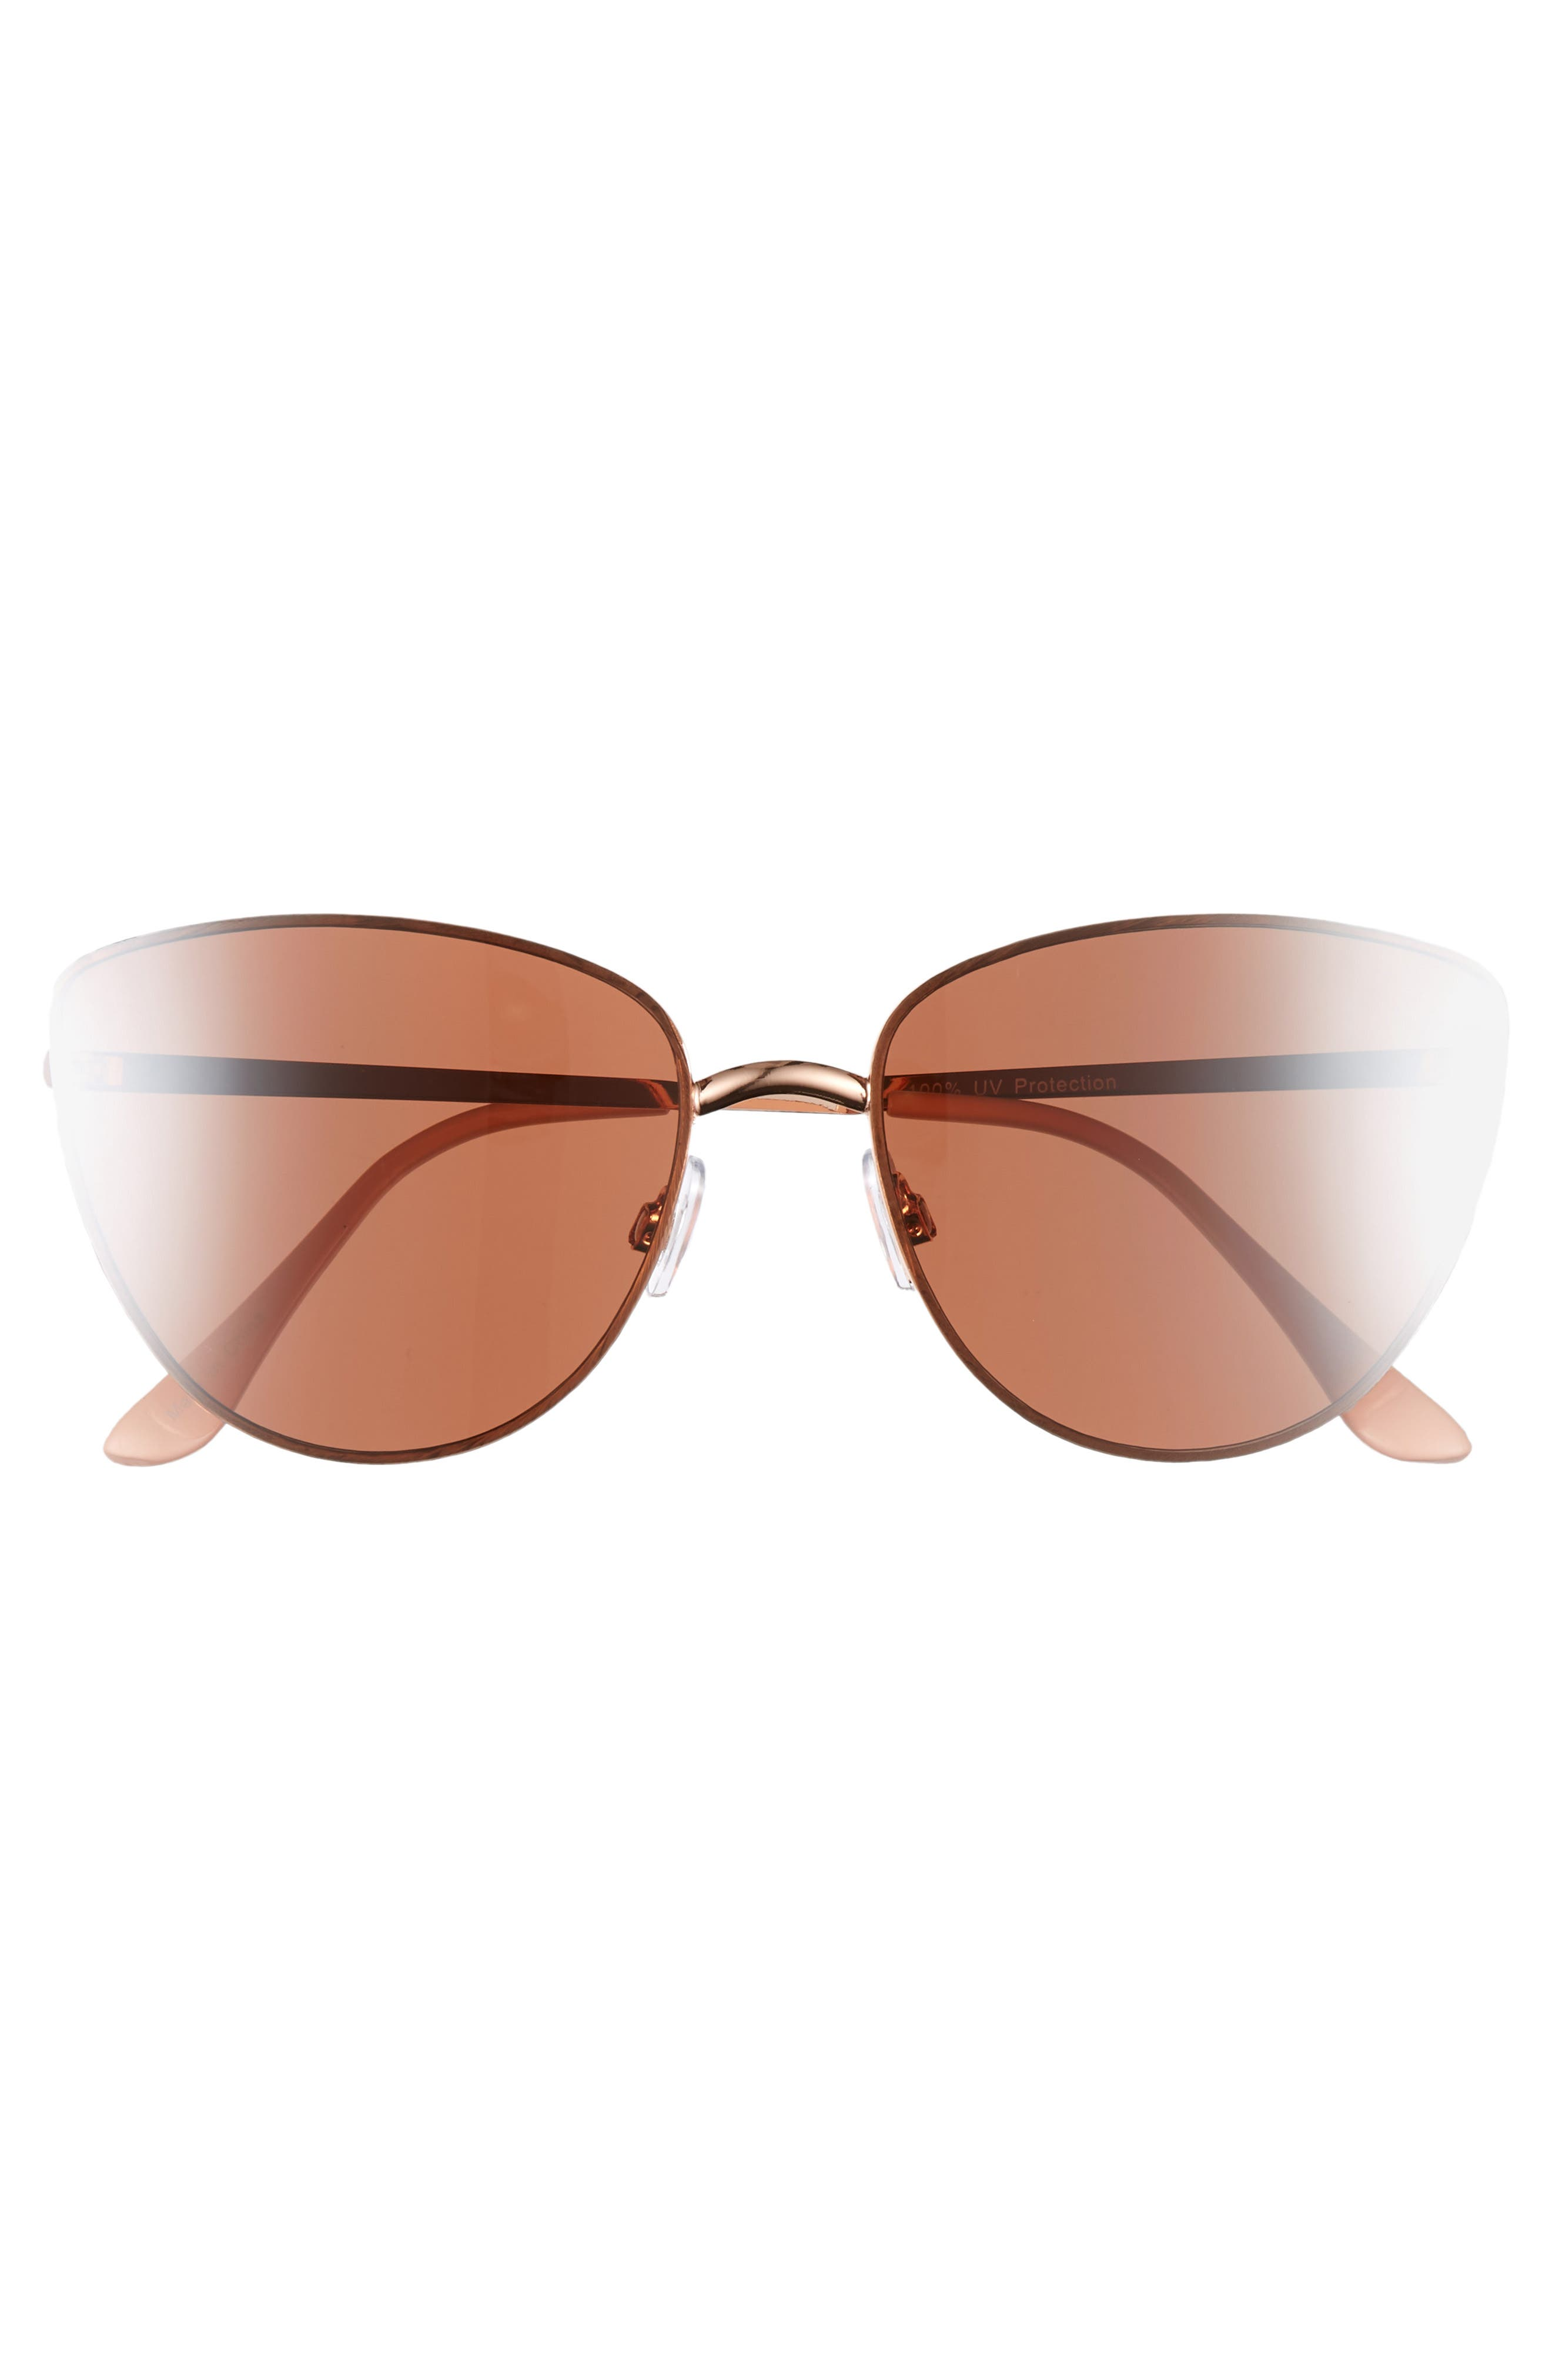 Rimless Cat Eye Sunglasses,                             Alternate thumbnail 3, color,                             ROSE GOLD